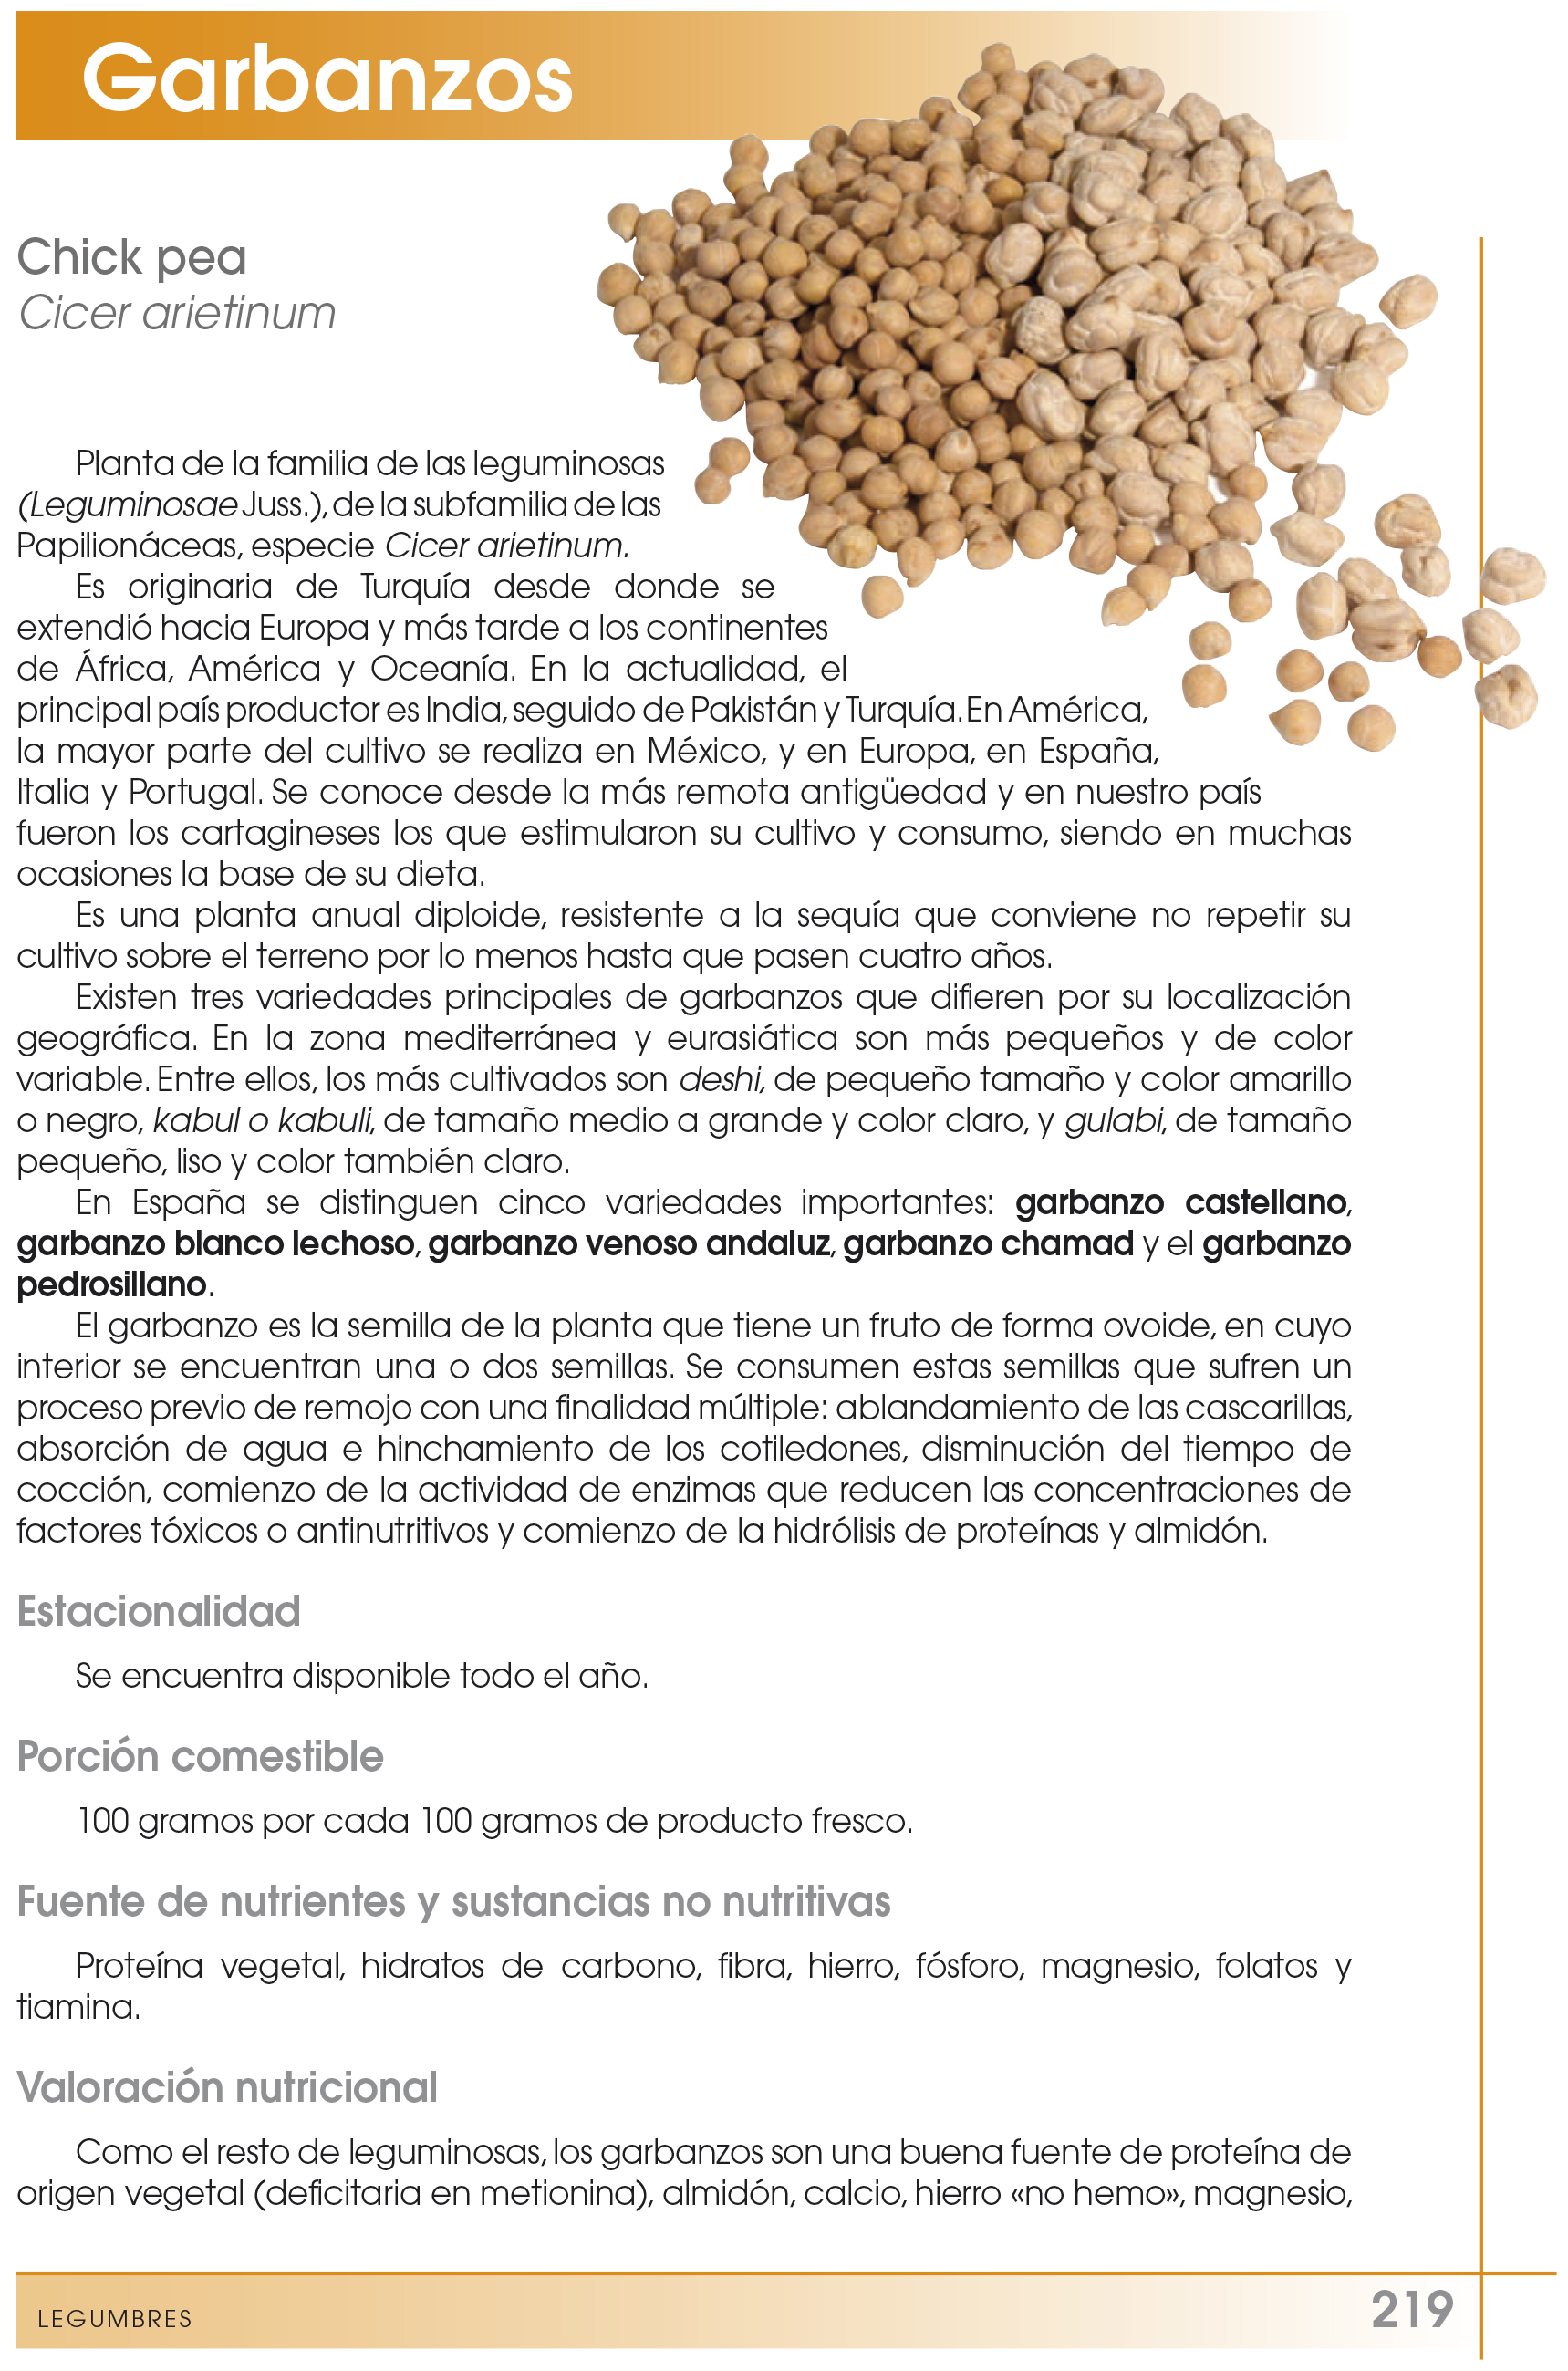 nutricional garbanzos